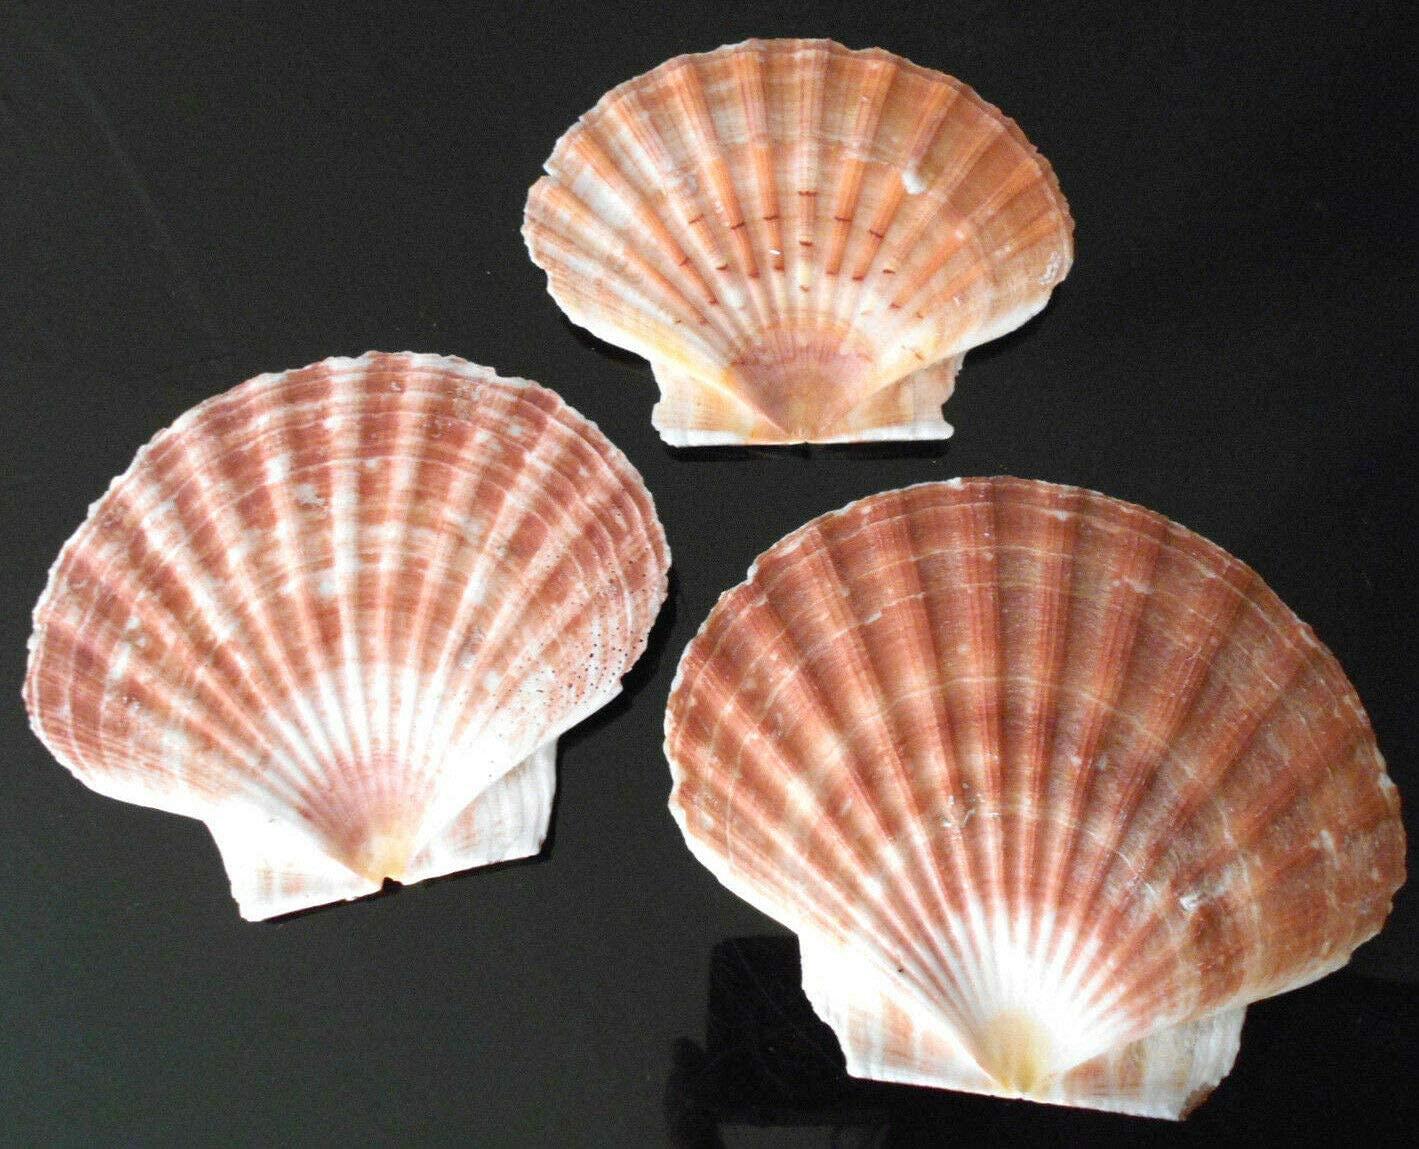 3 Irish Flat Scallops Shells Seashell 3-4 Crafts Beach Cottage Nautical Decor - Ocean Beach Seashells Perfect for Home Decoration, Art Craft, Vase Filler Fish Tank